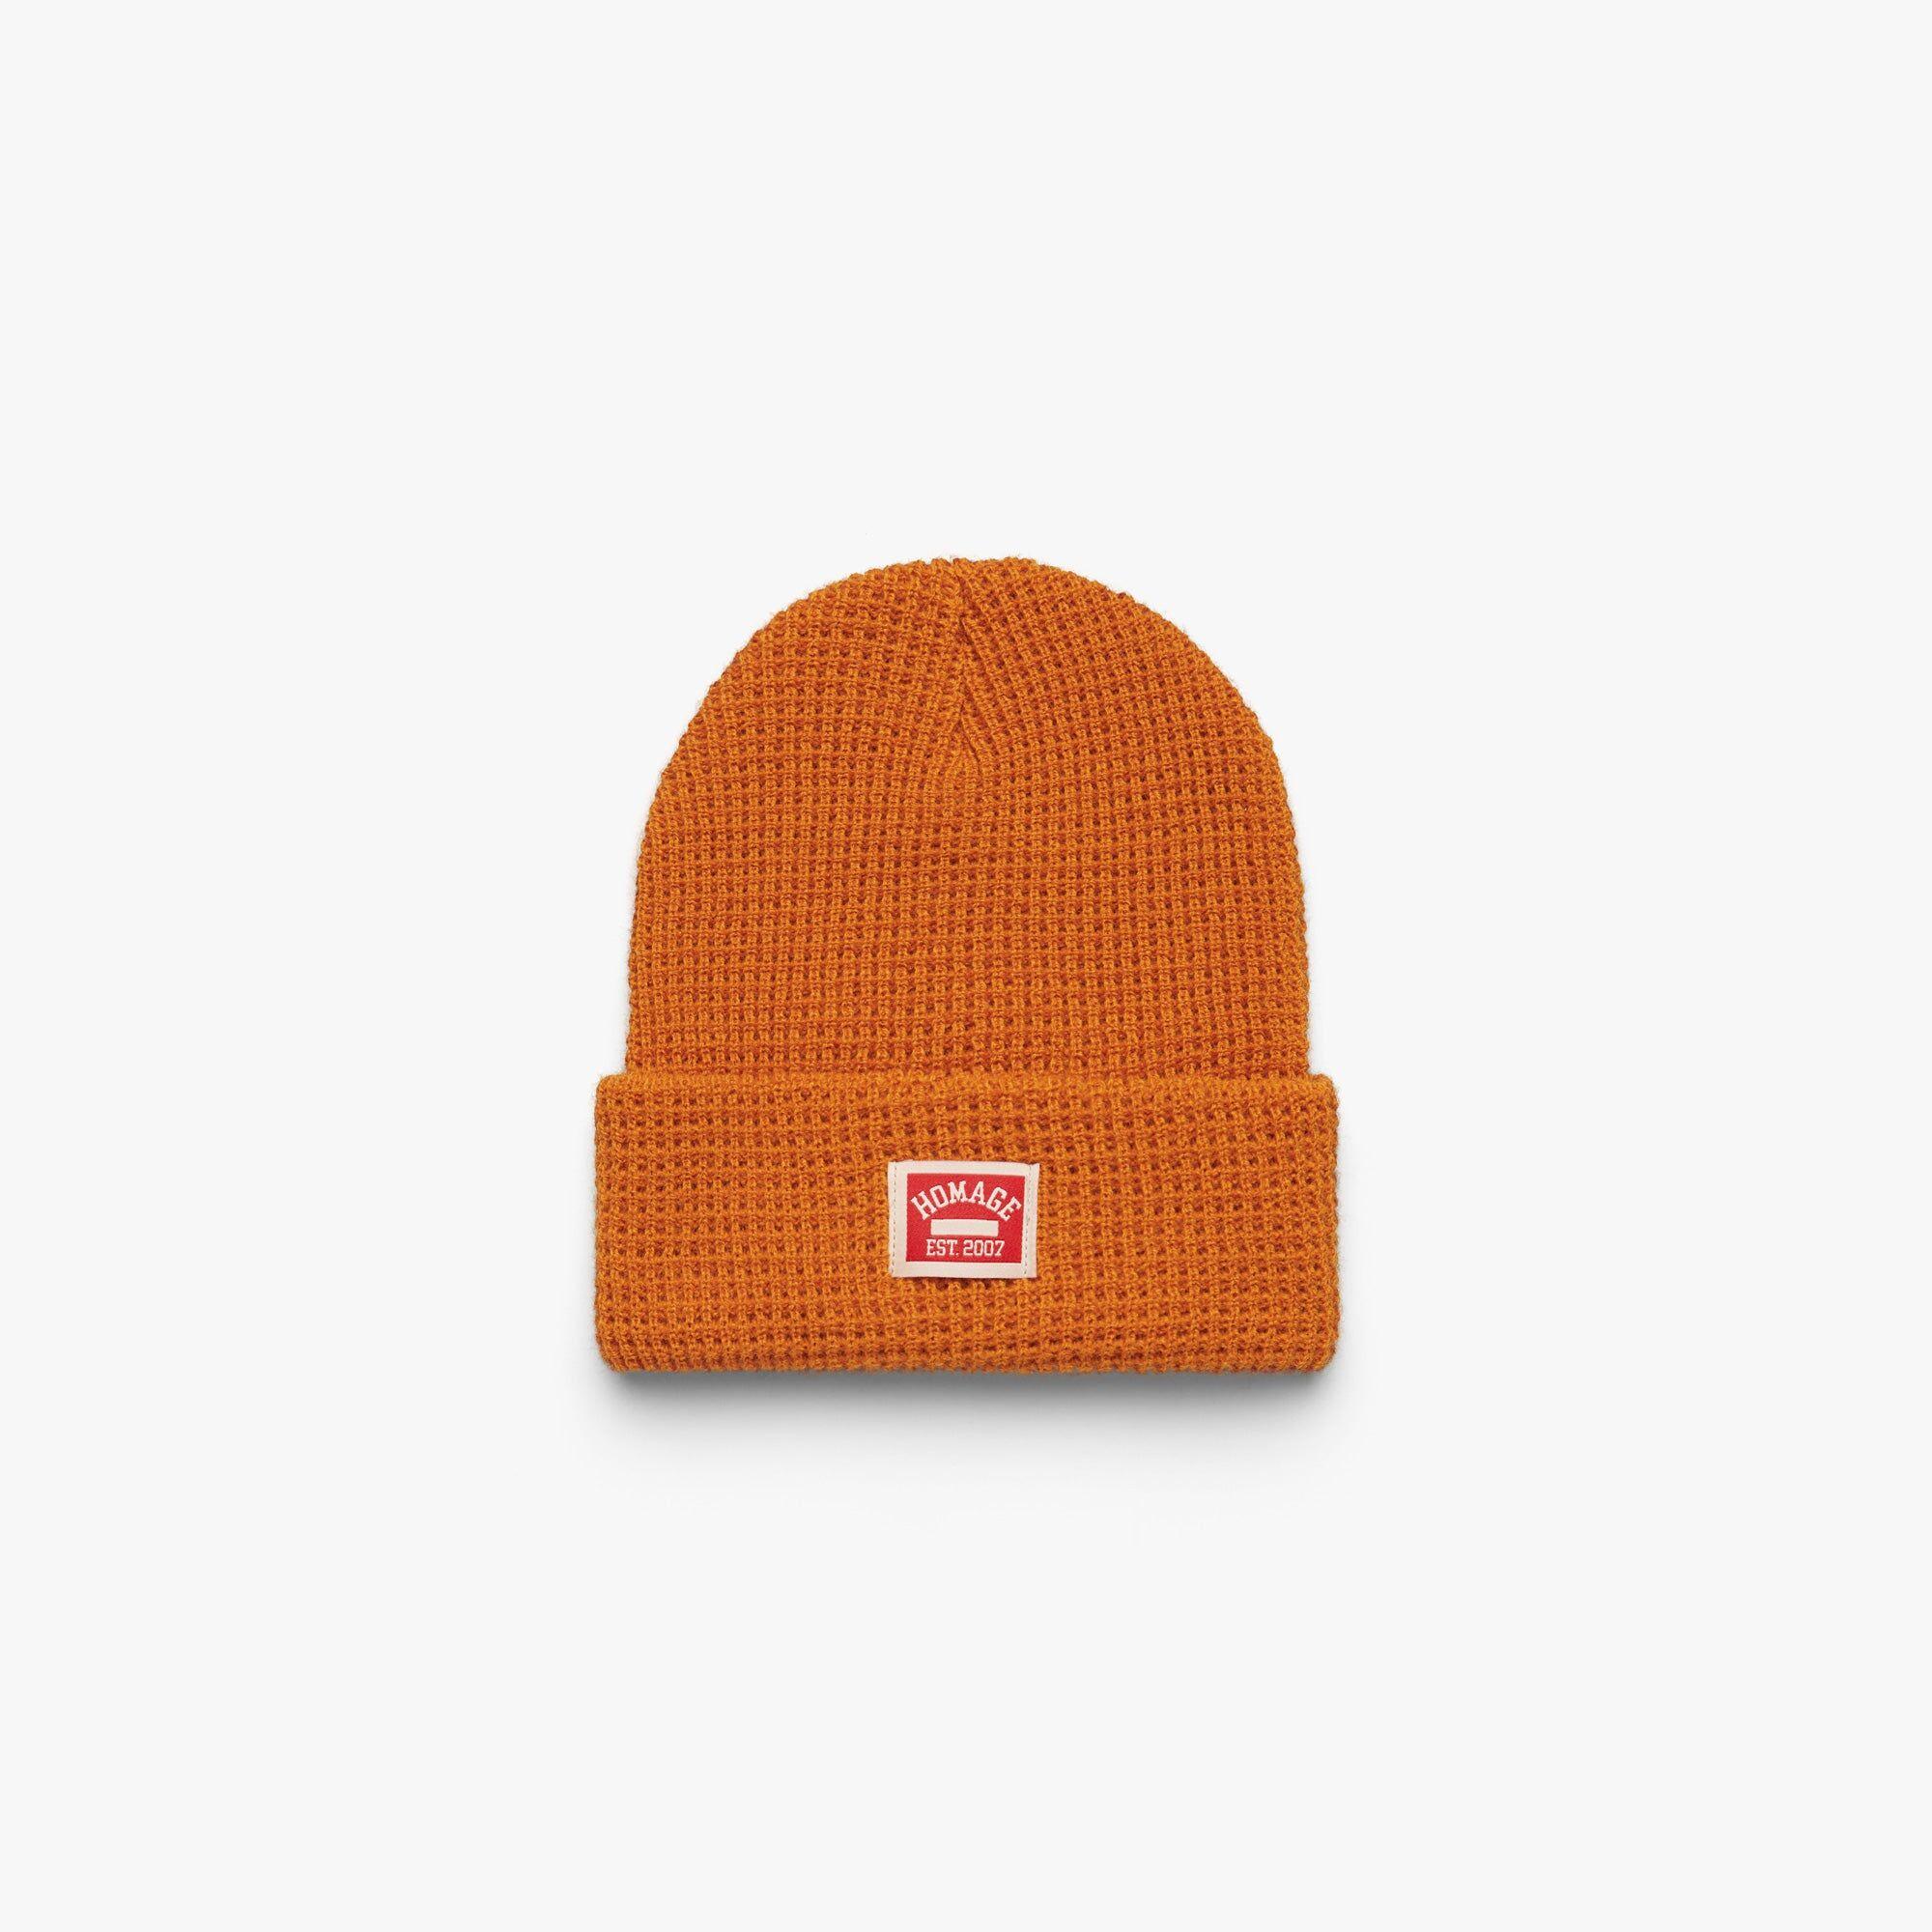 HOMAGE Go-To Beanie in  Orange (Size: One Size)